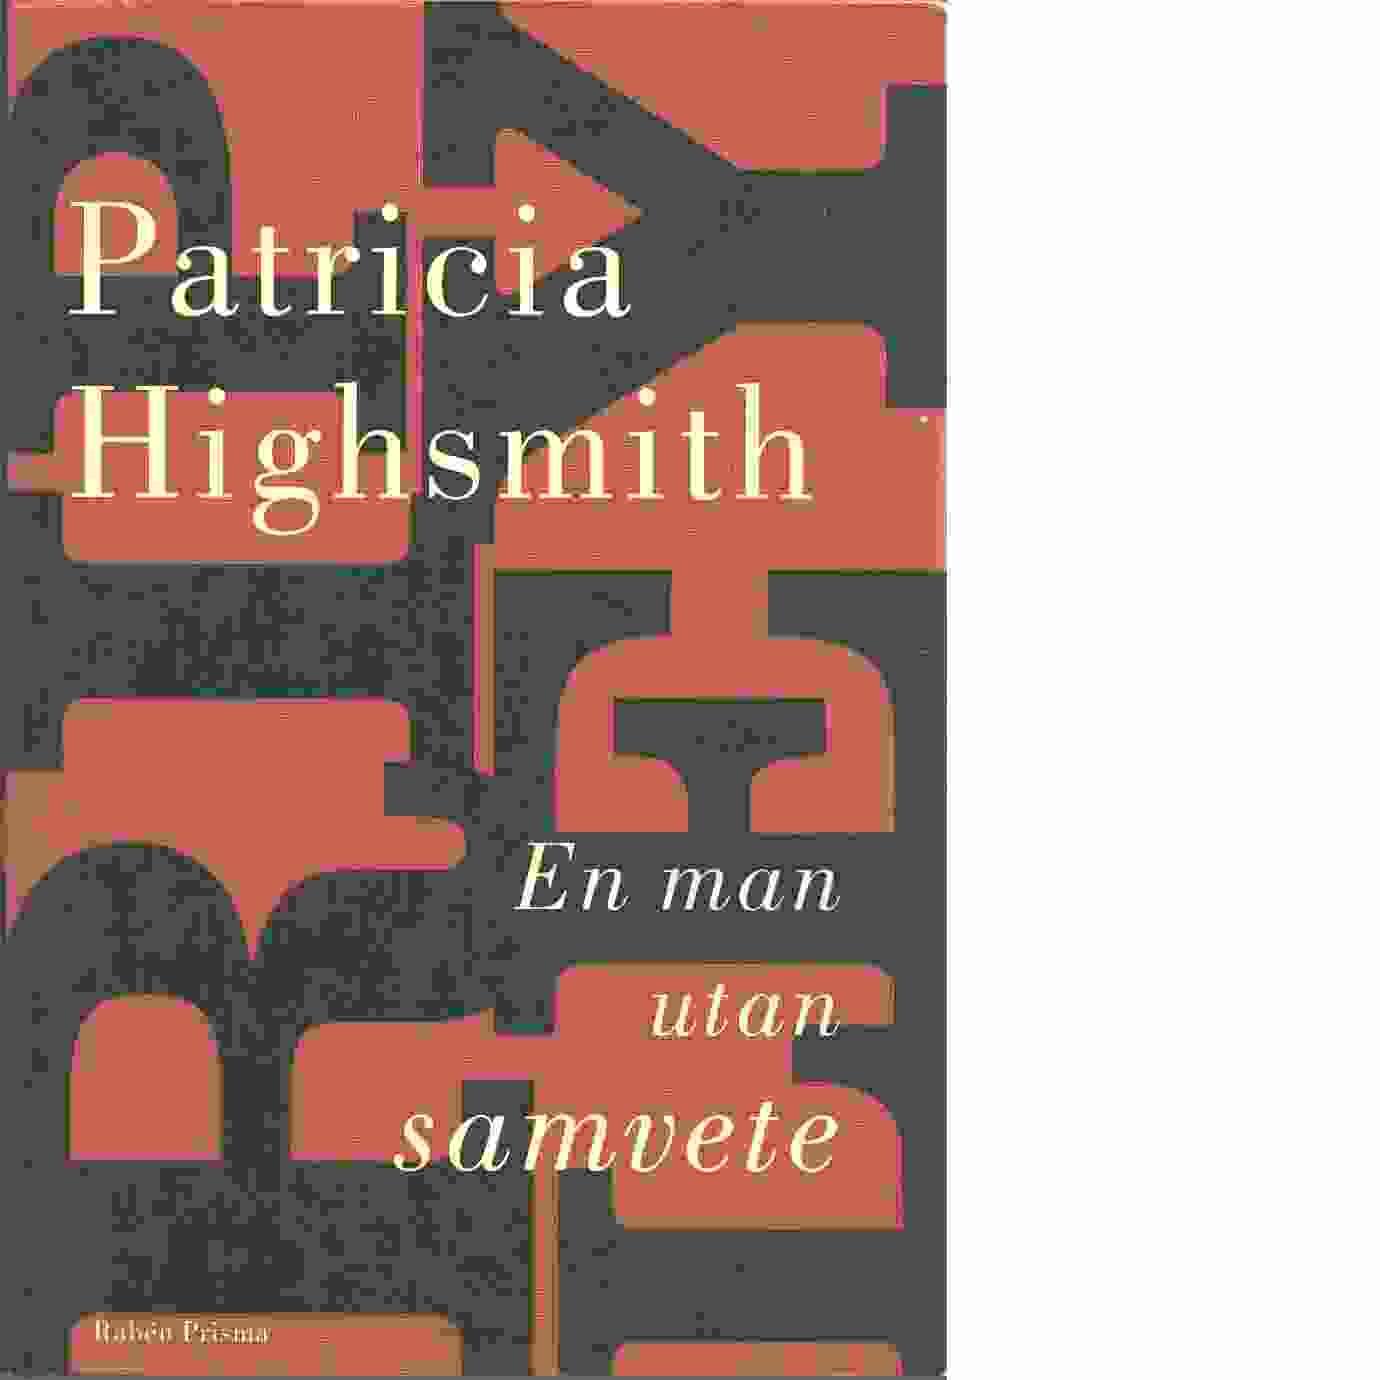 En man utan samvete - Highsmith, Patricia